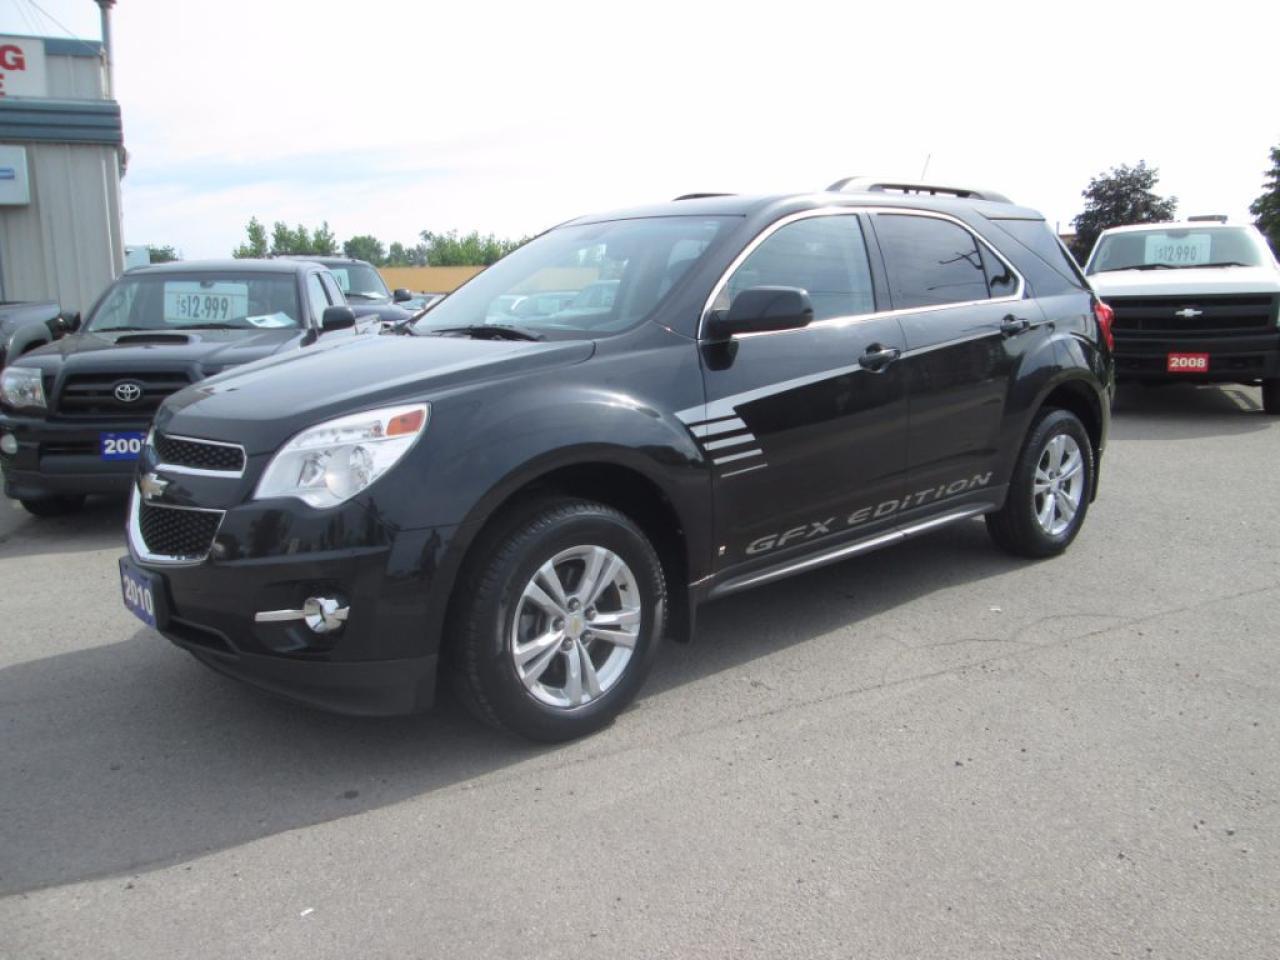 Photo of Black 2010 Chevrolet Equinox